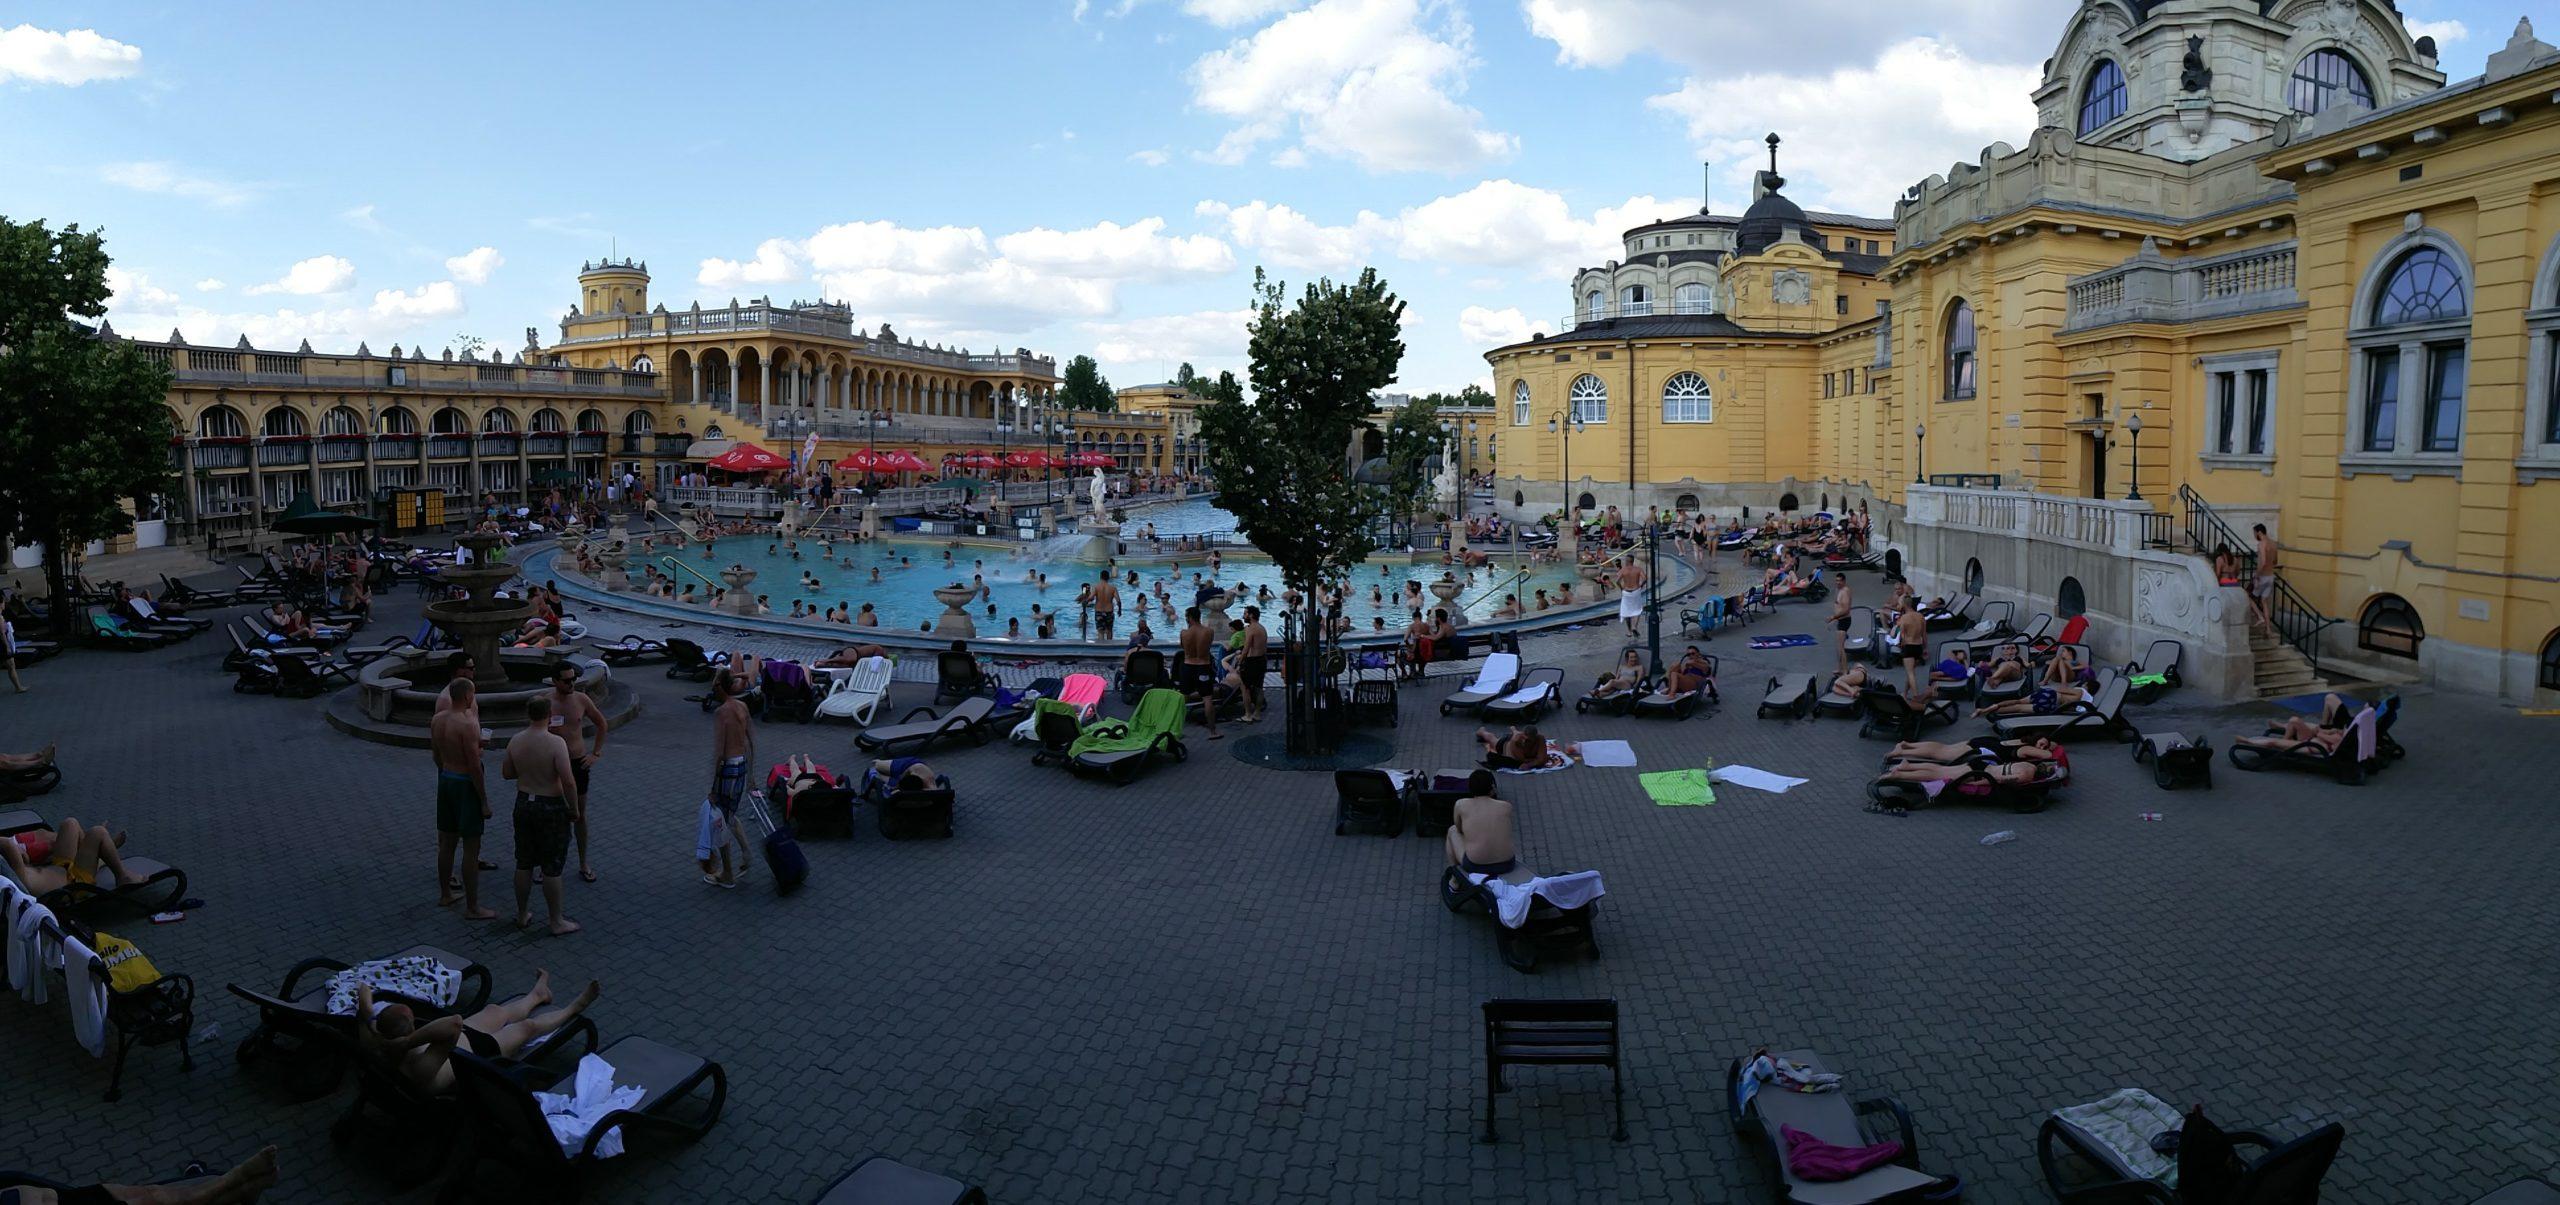 Thermes Szechenyi Budapest Hongrie